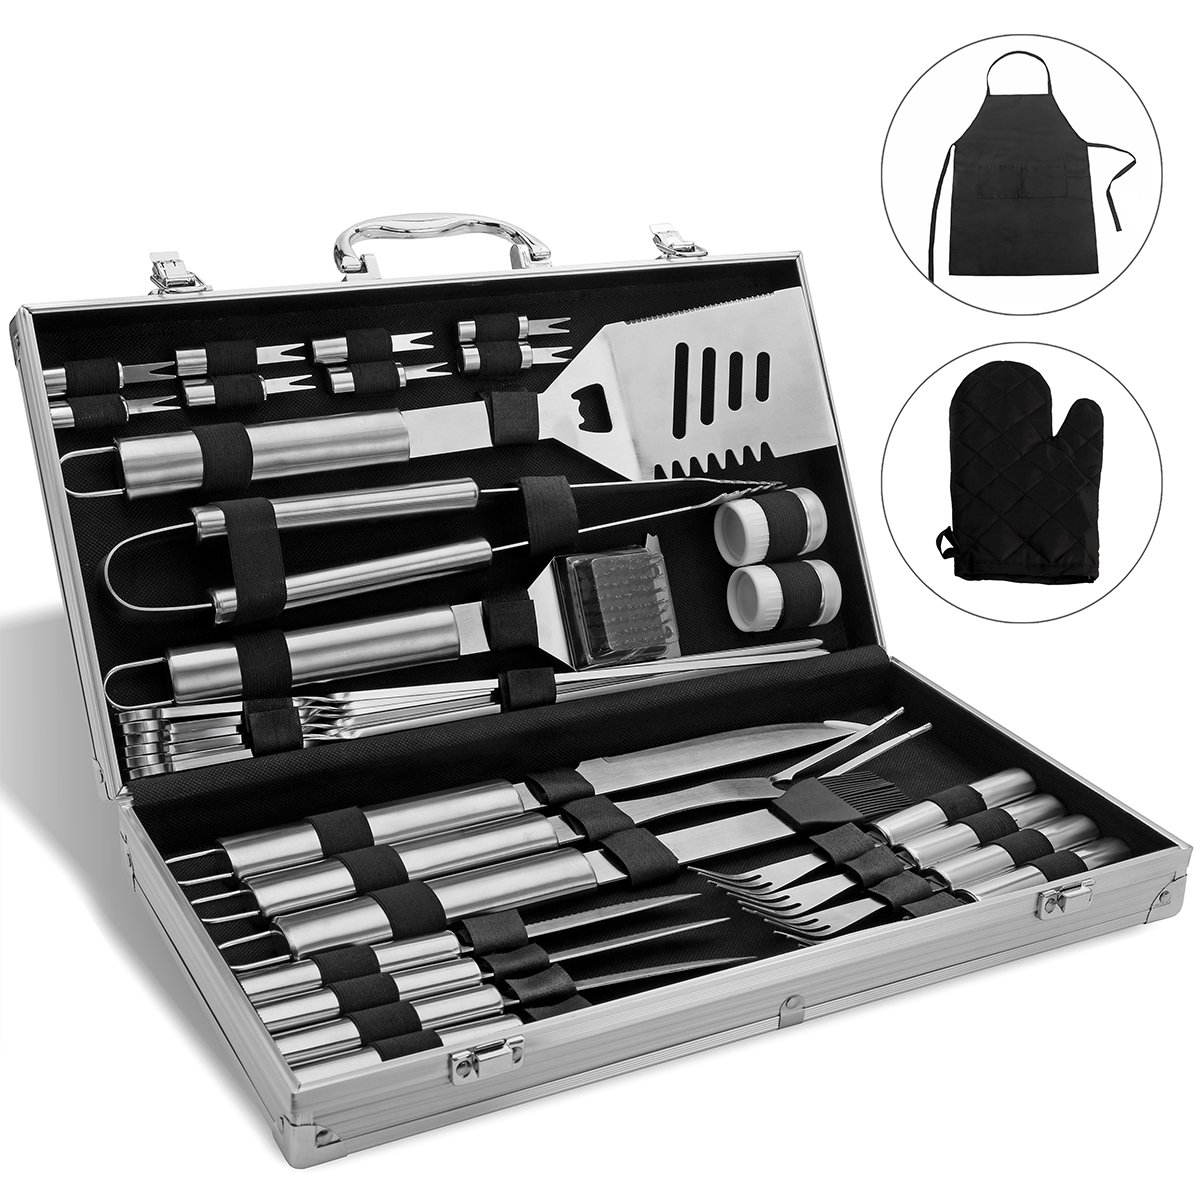 monbix gl-70733 barbacoa accesorios, 33 piezas, utensilios ...